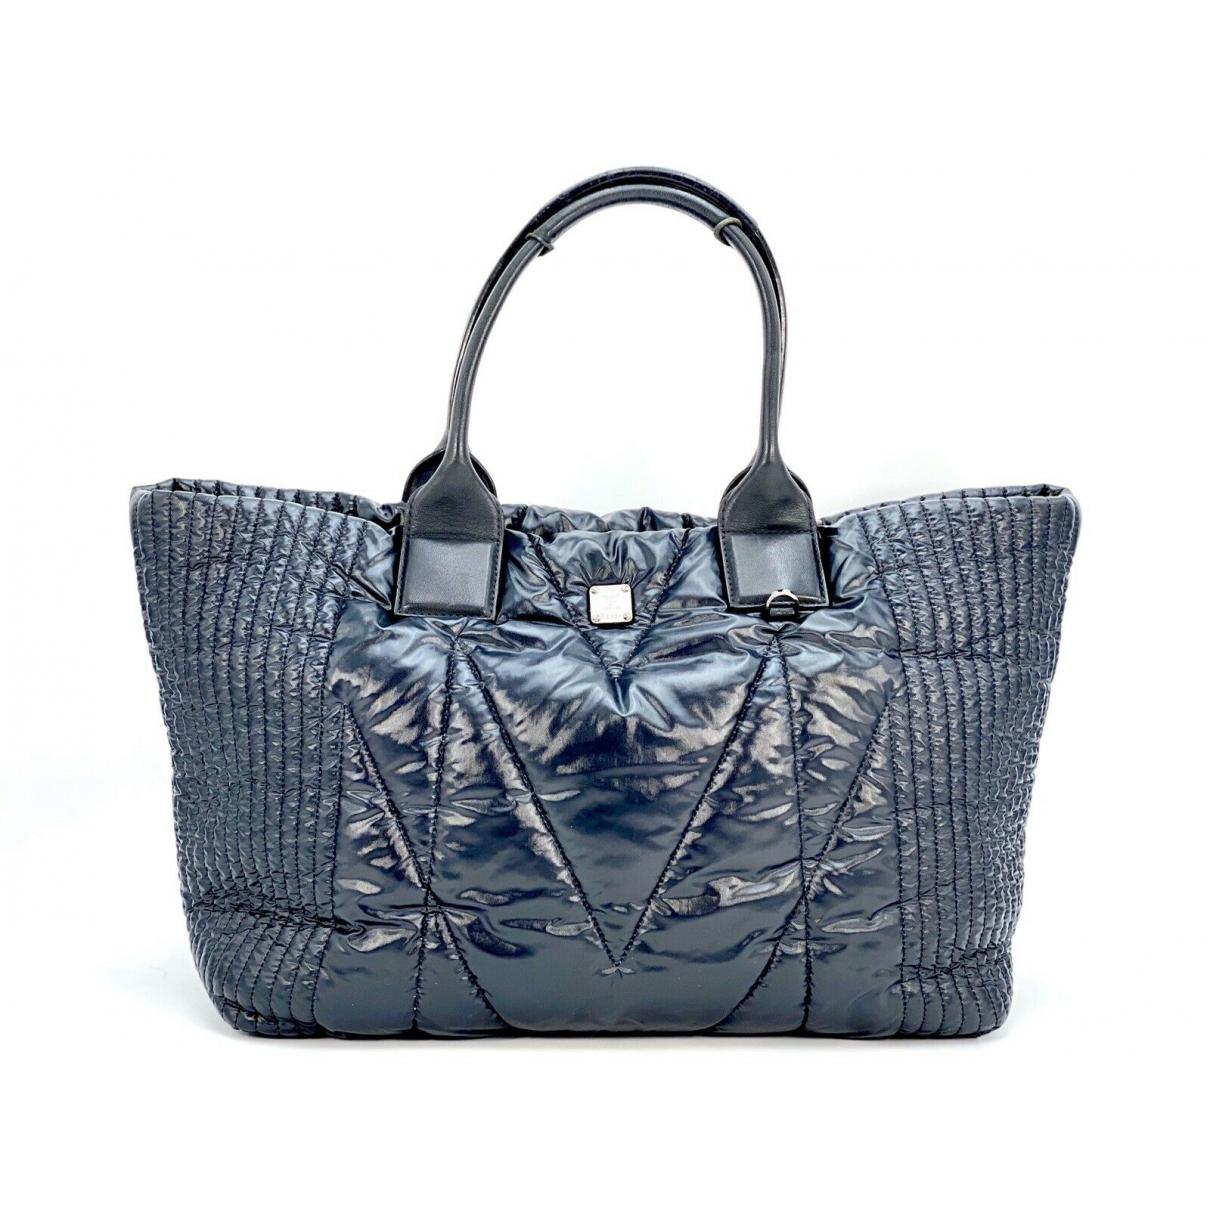 Mcm \N Black handbag for Women \N